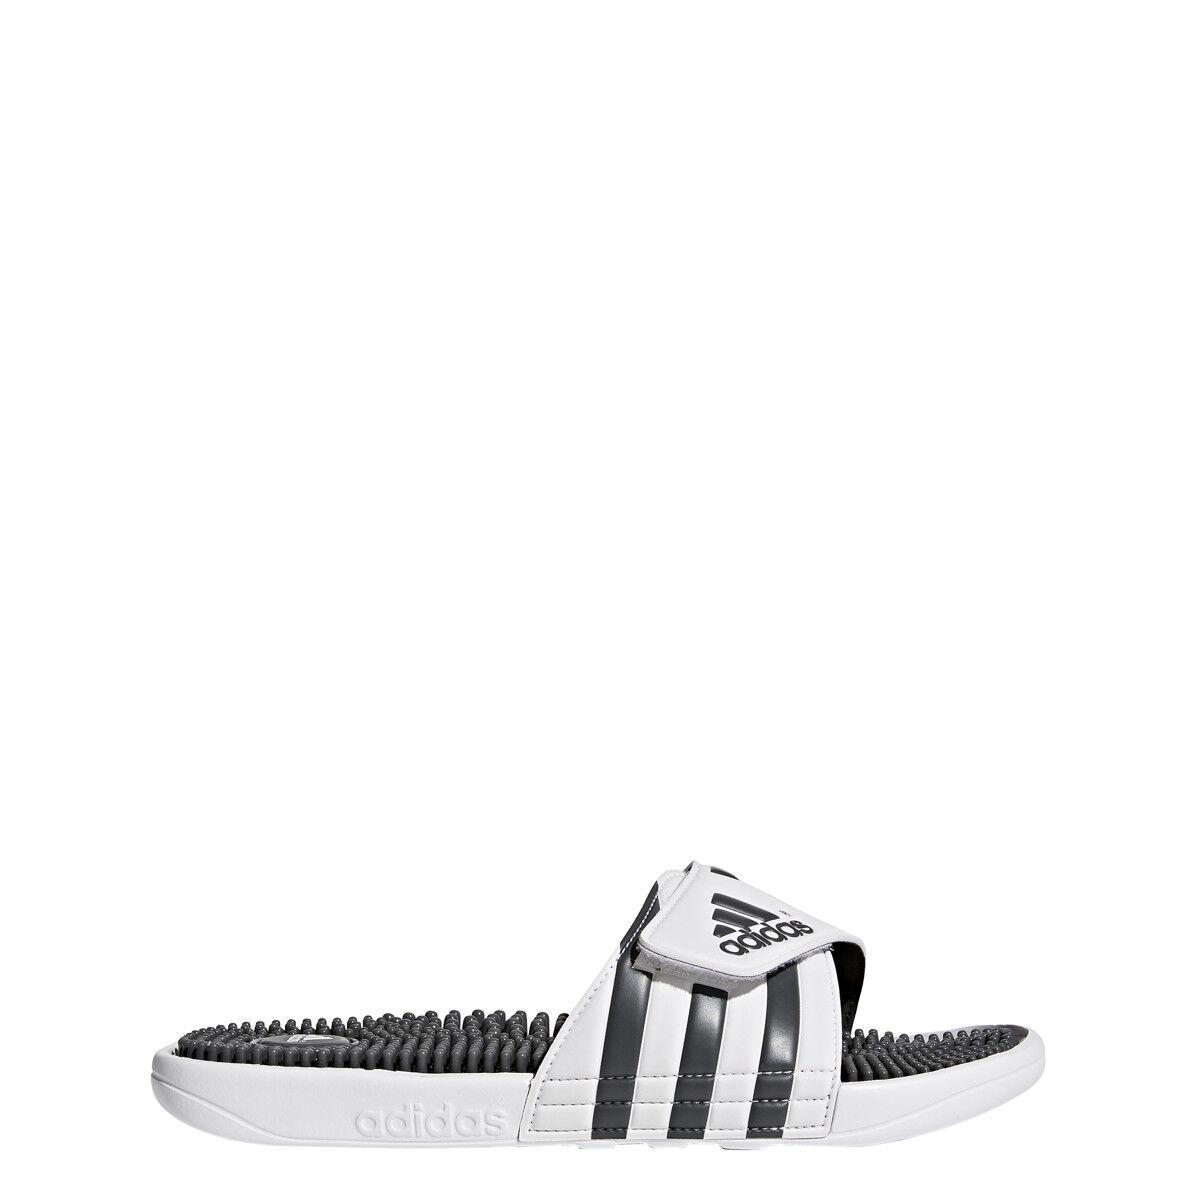 Mens Adidas Adissage White Slides Shower Athletic Sport Sand